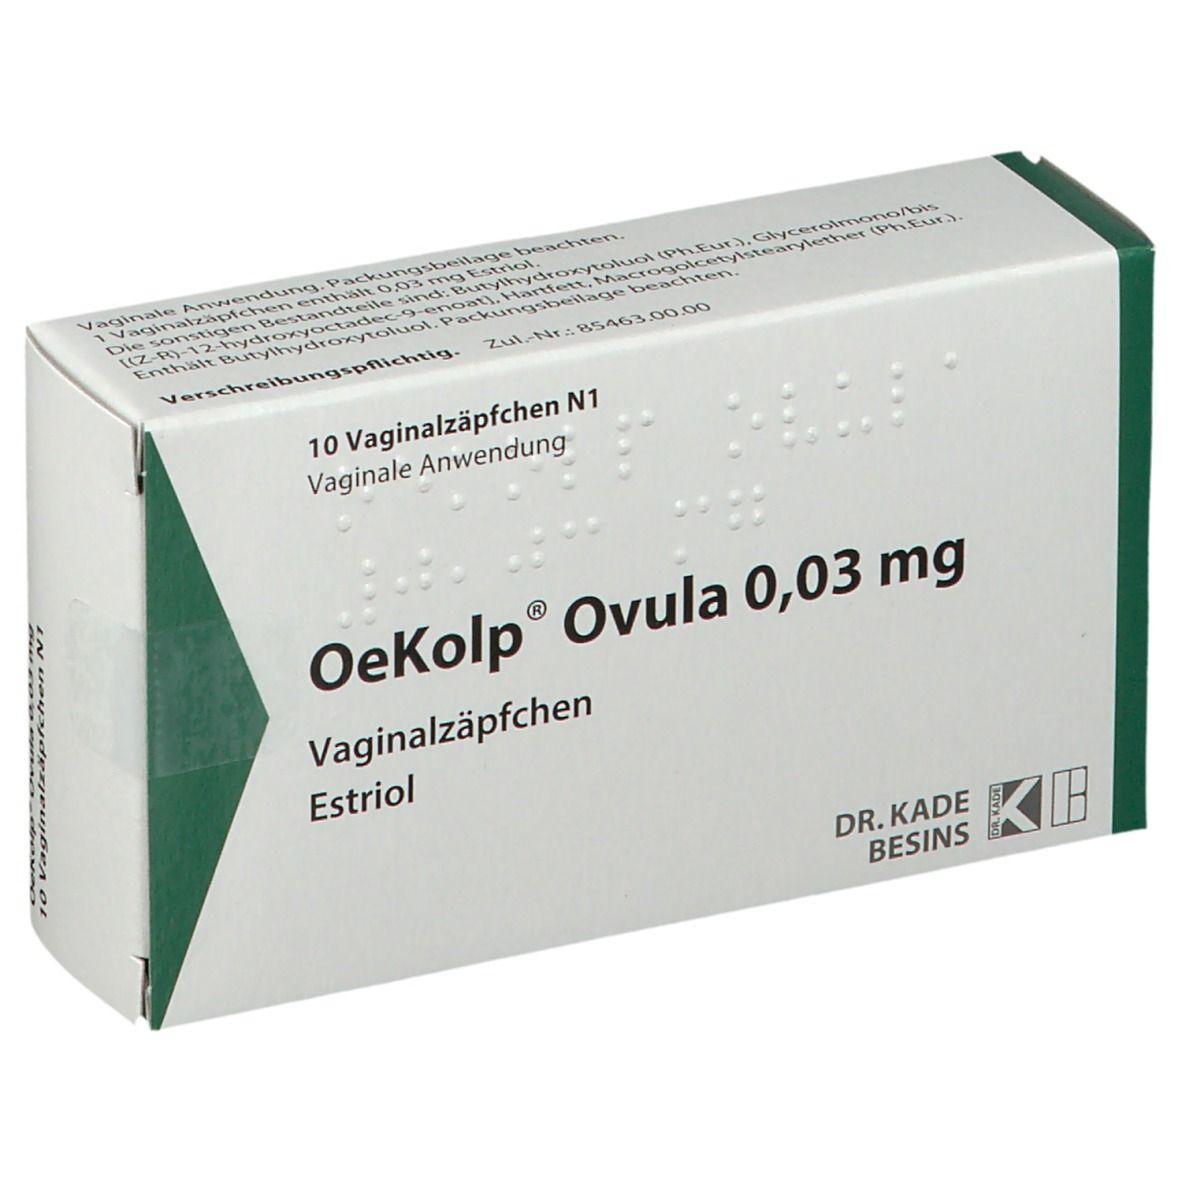 Ovula zäpfchen erfahrungen oekolp Unangenehmer Harndrang